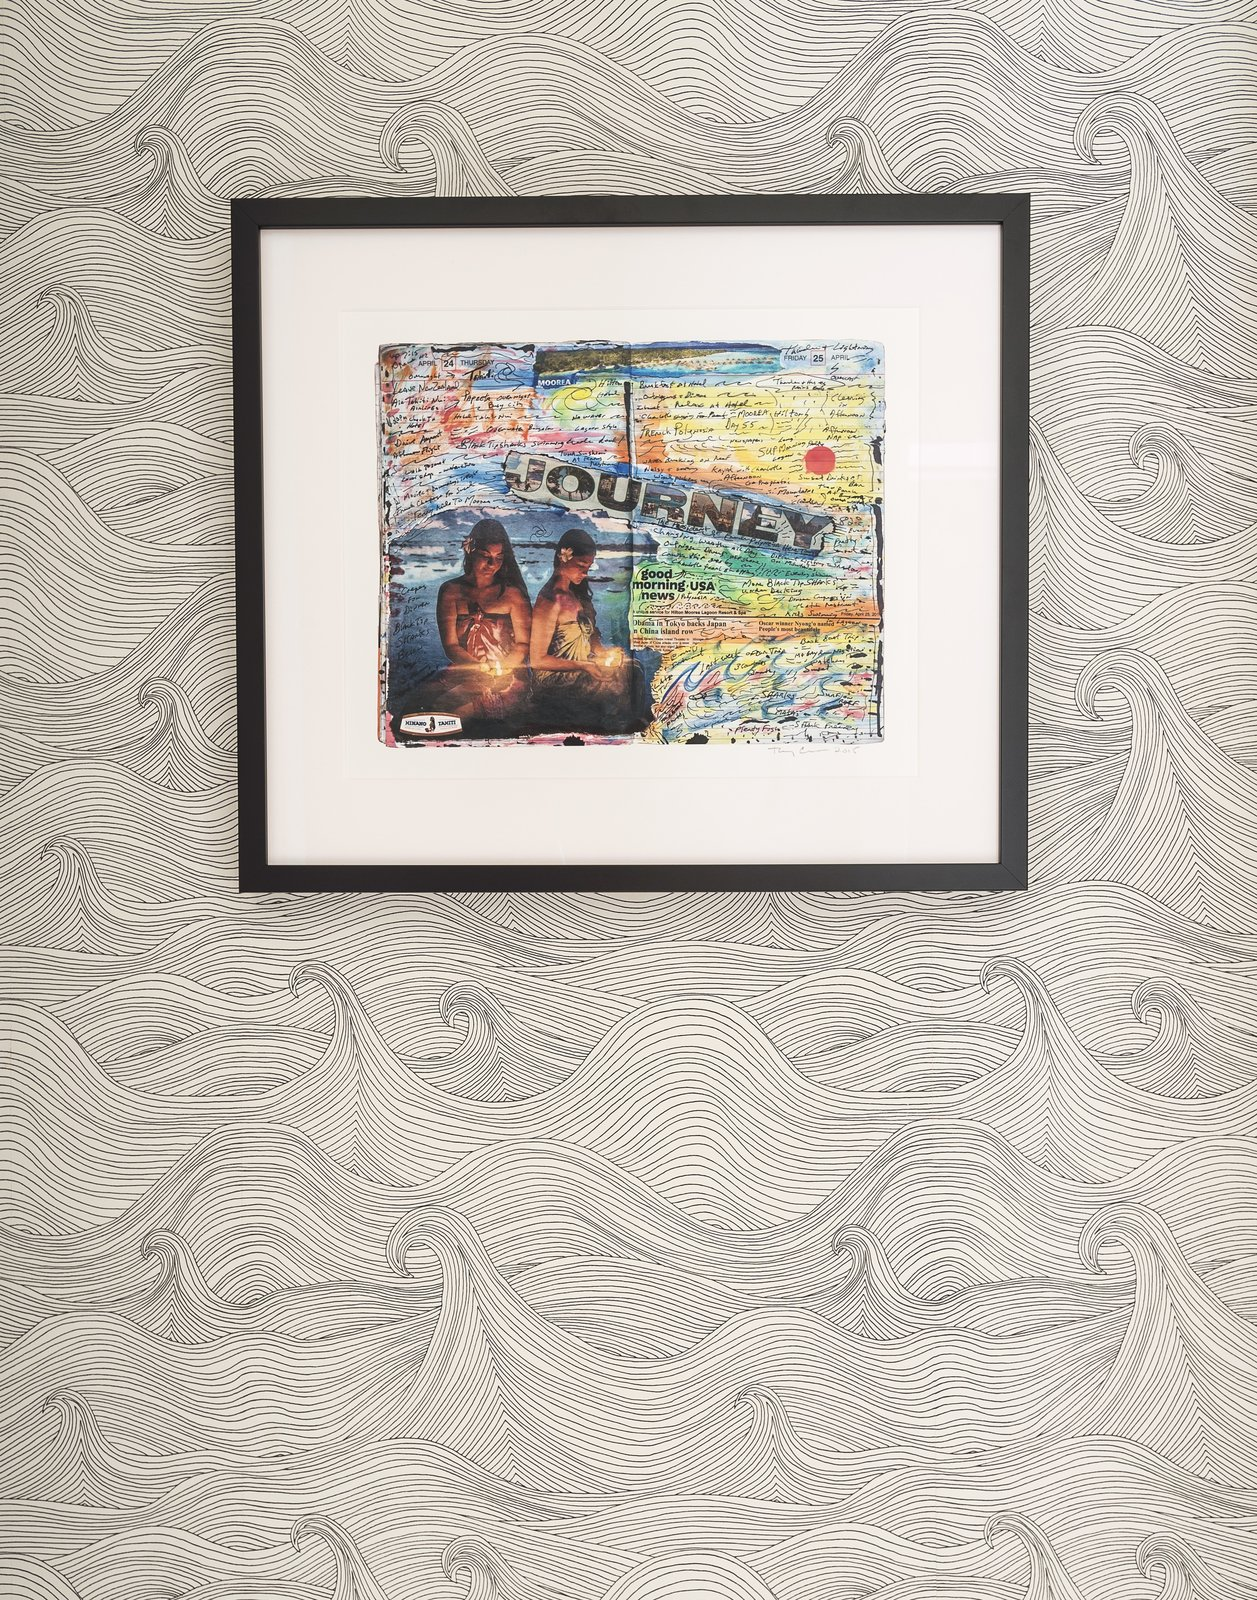 Montauk Surf Shack wallpaper